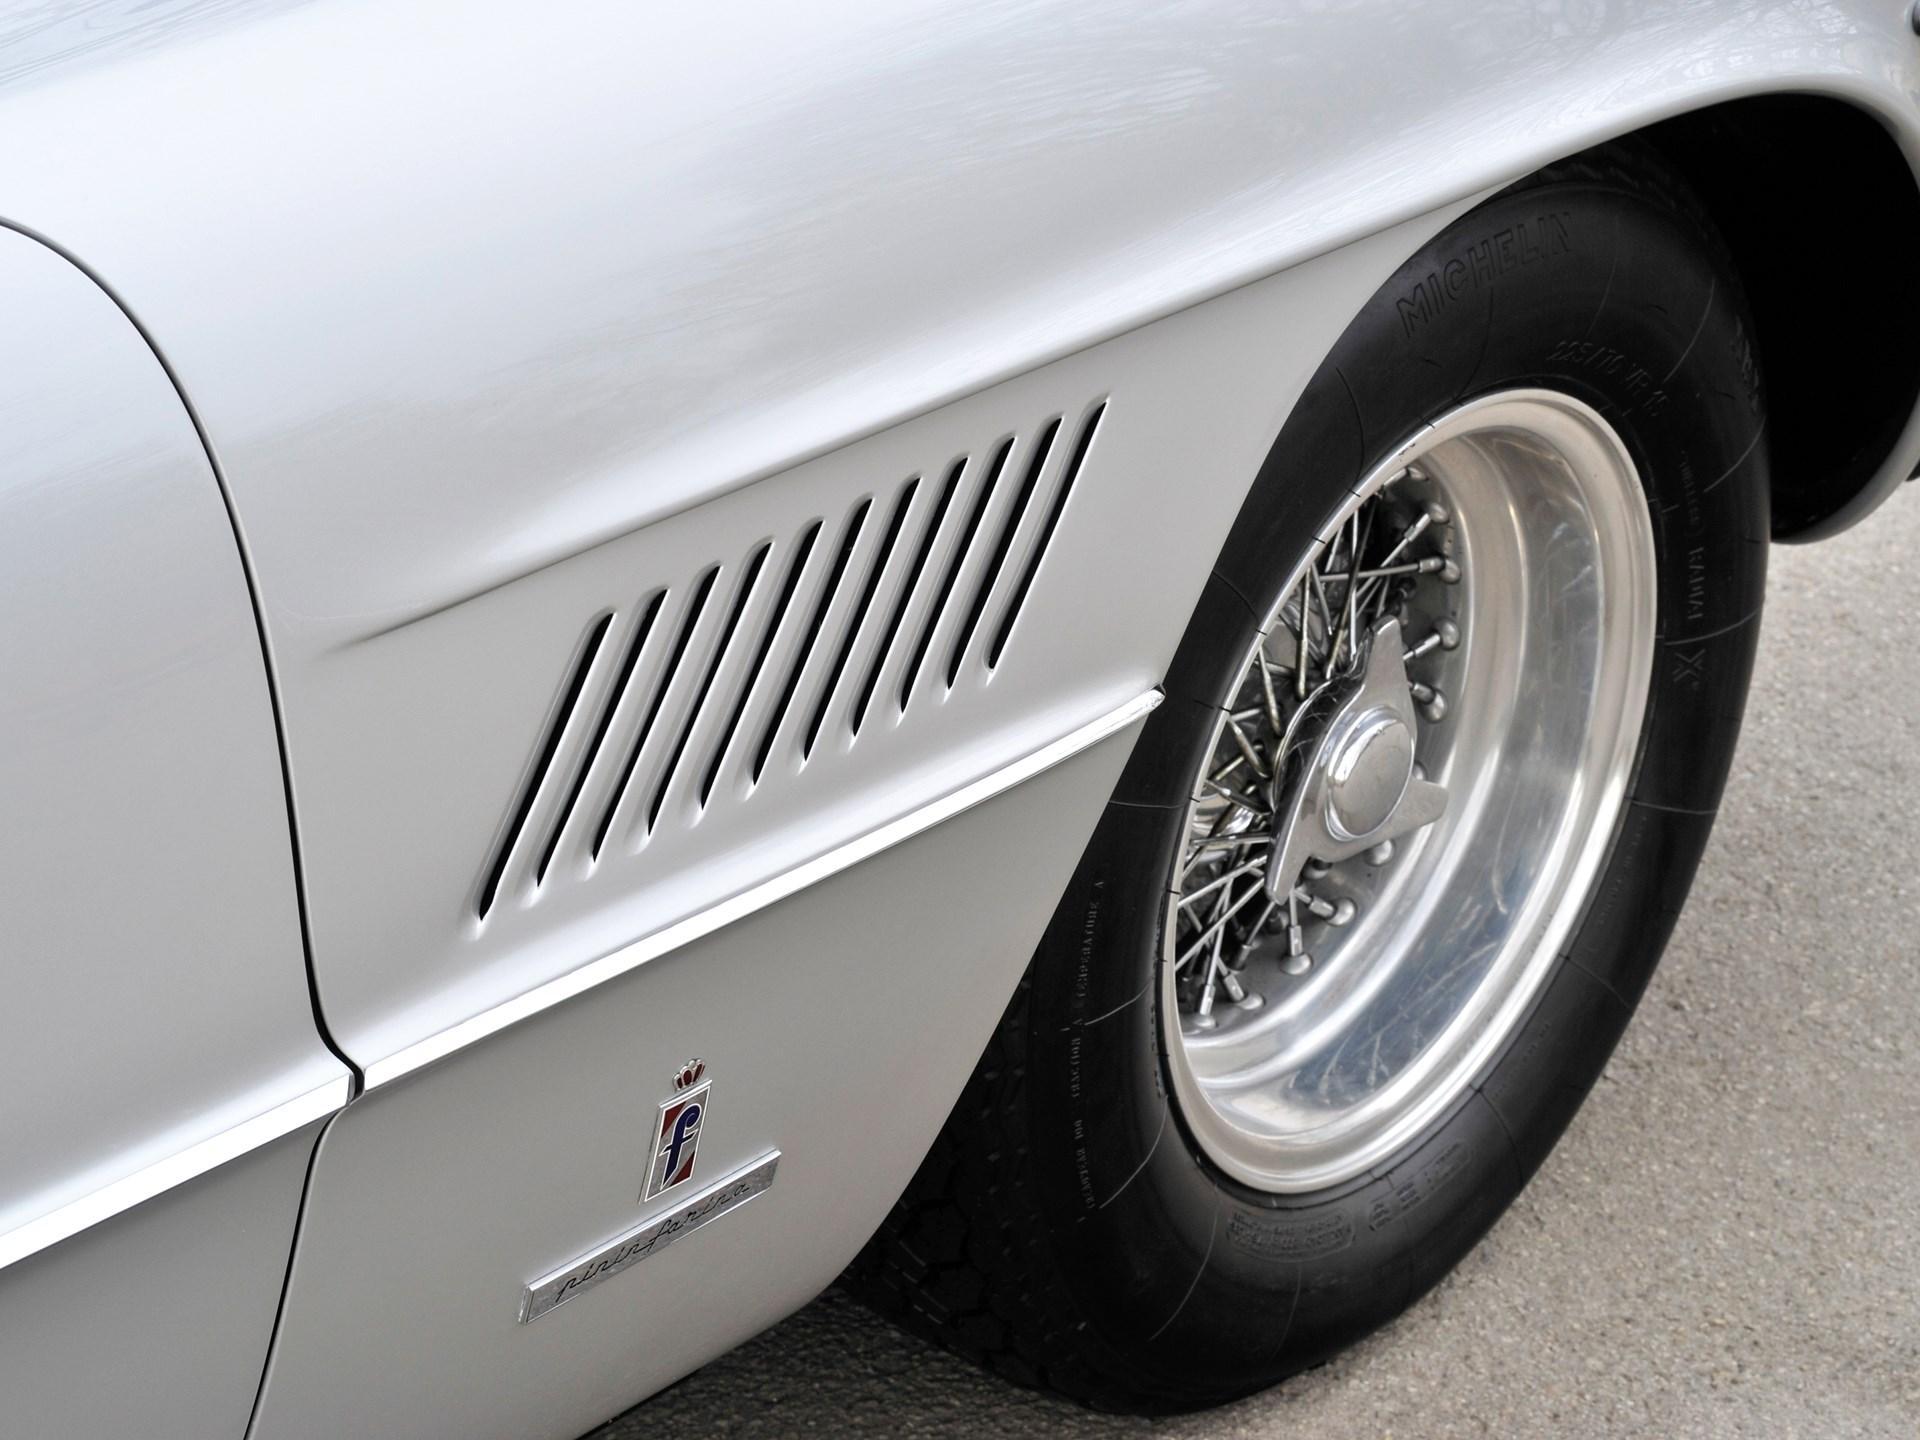 1962 Ferrari 400 Superamerica LWB Coupé Aerodinamico by Pininfarina